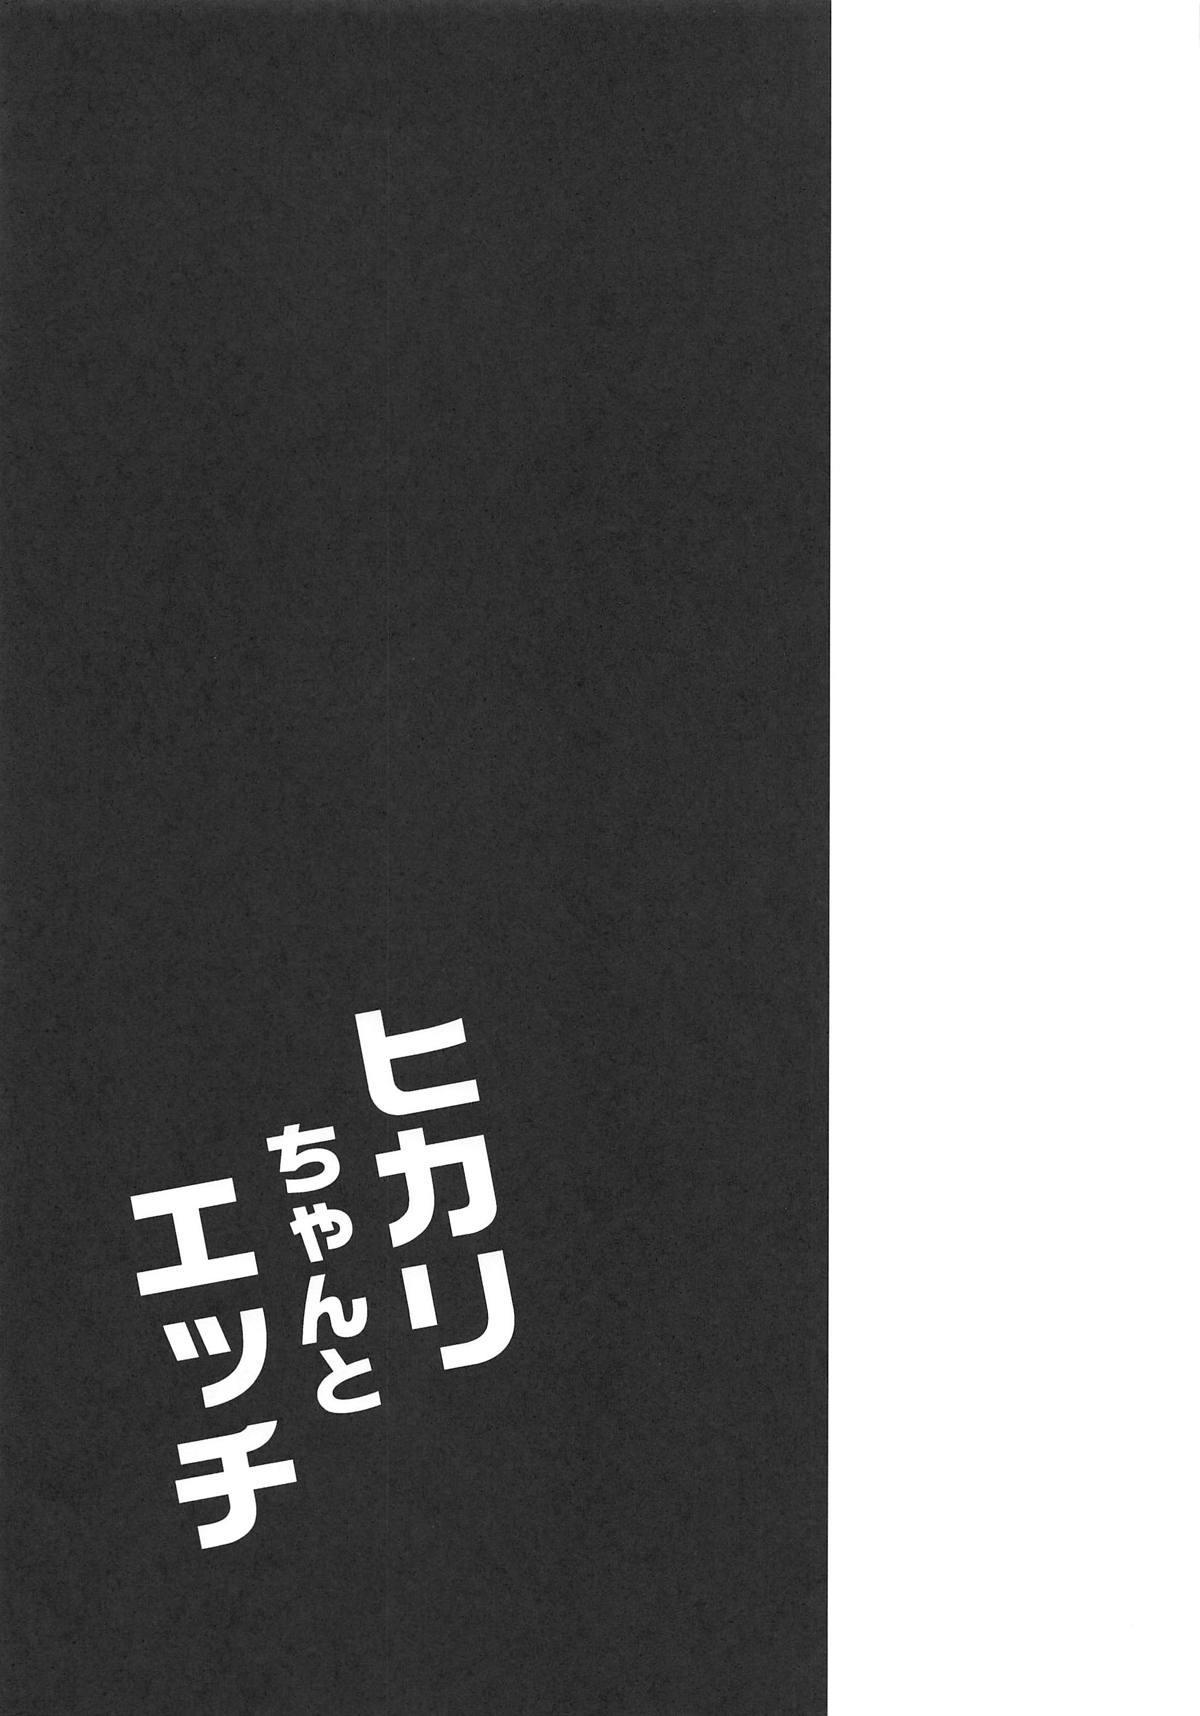 Hikari-chan to Ecchi 19